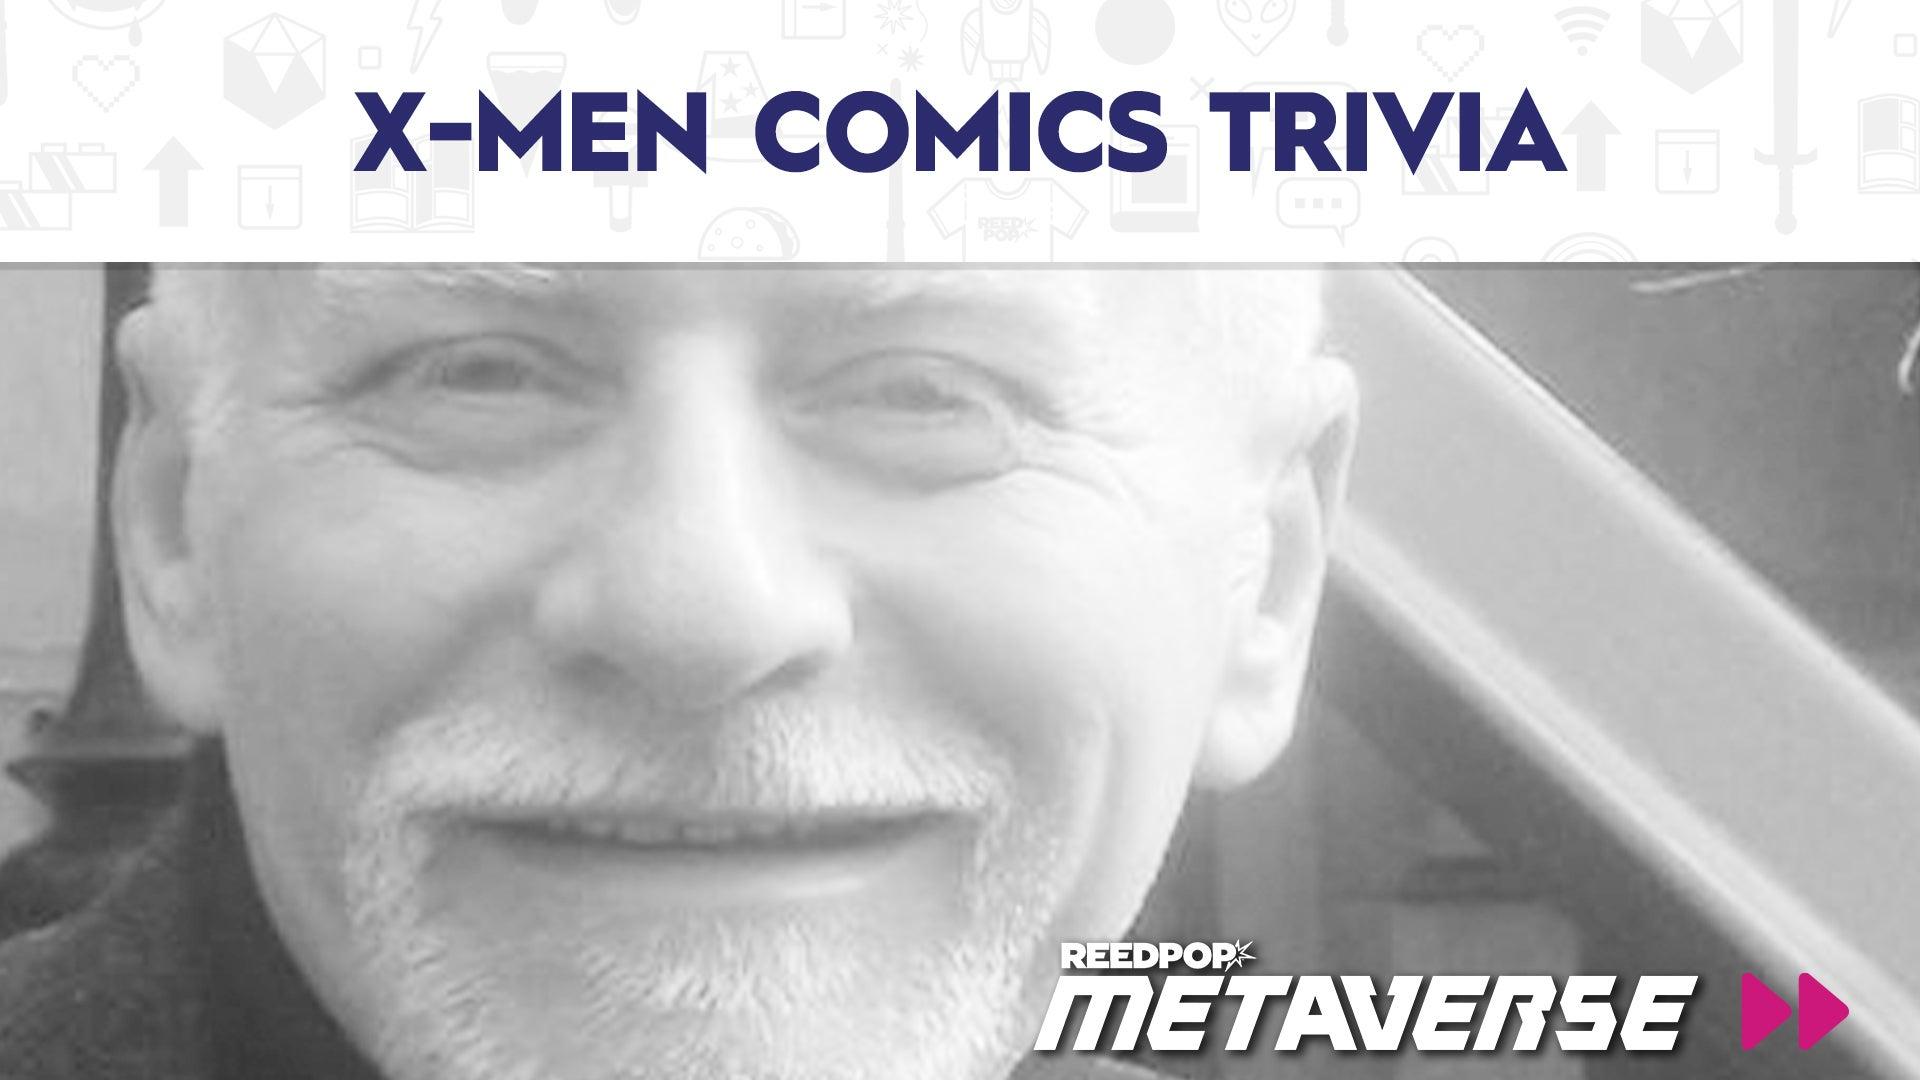 Image for X-Men Comics Trivia with Chris Claremont